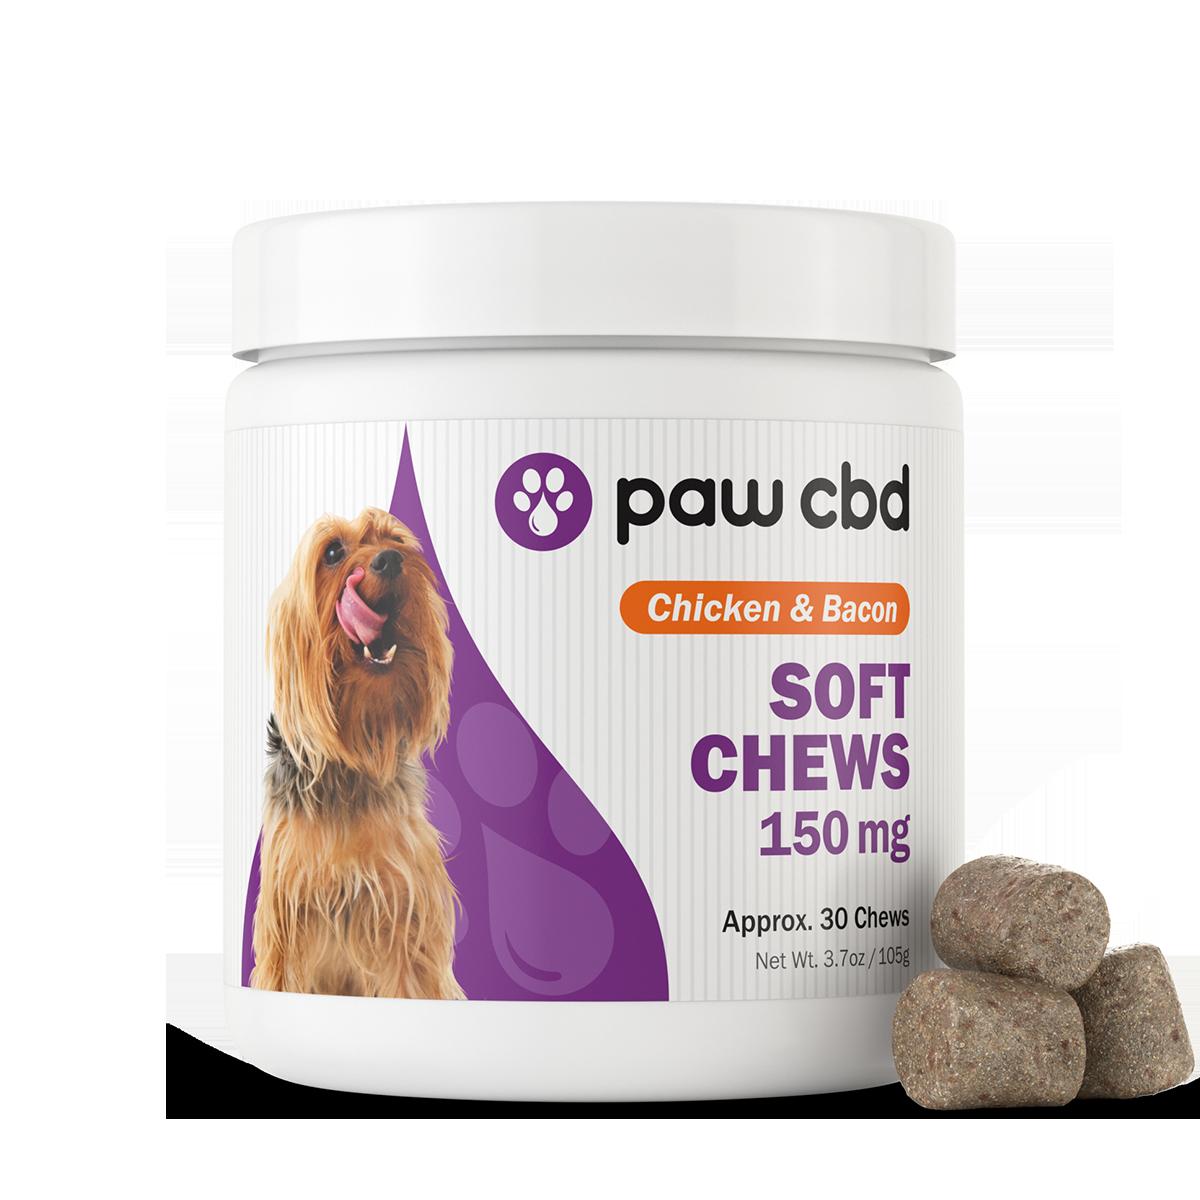 Paw CBD Soft Chews 150mg, 30ct